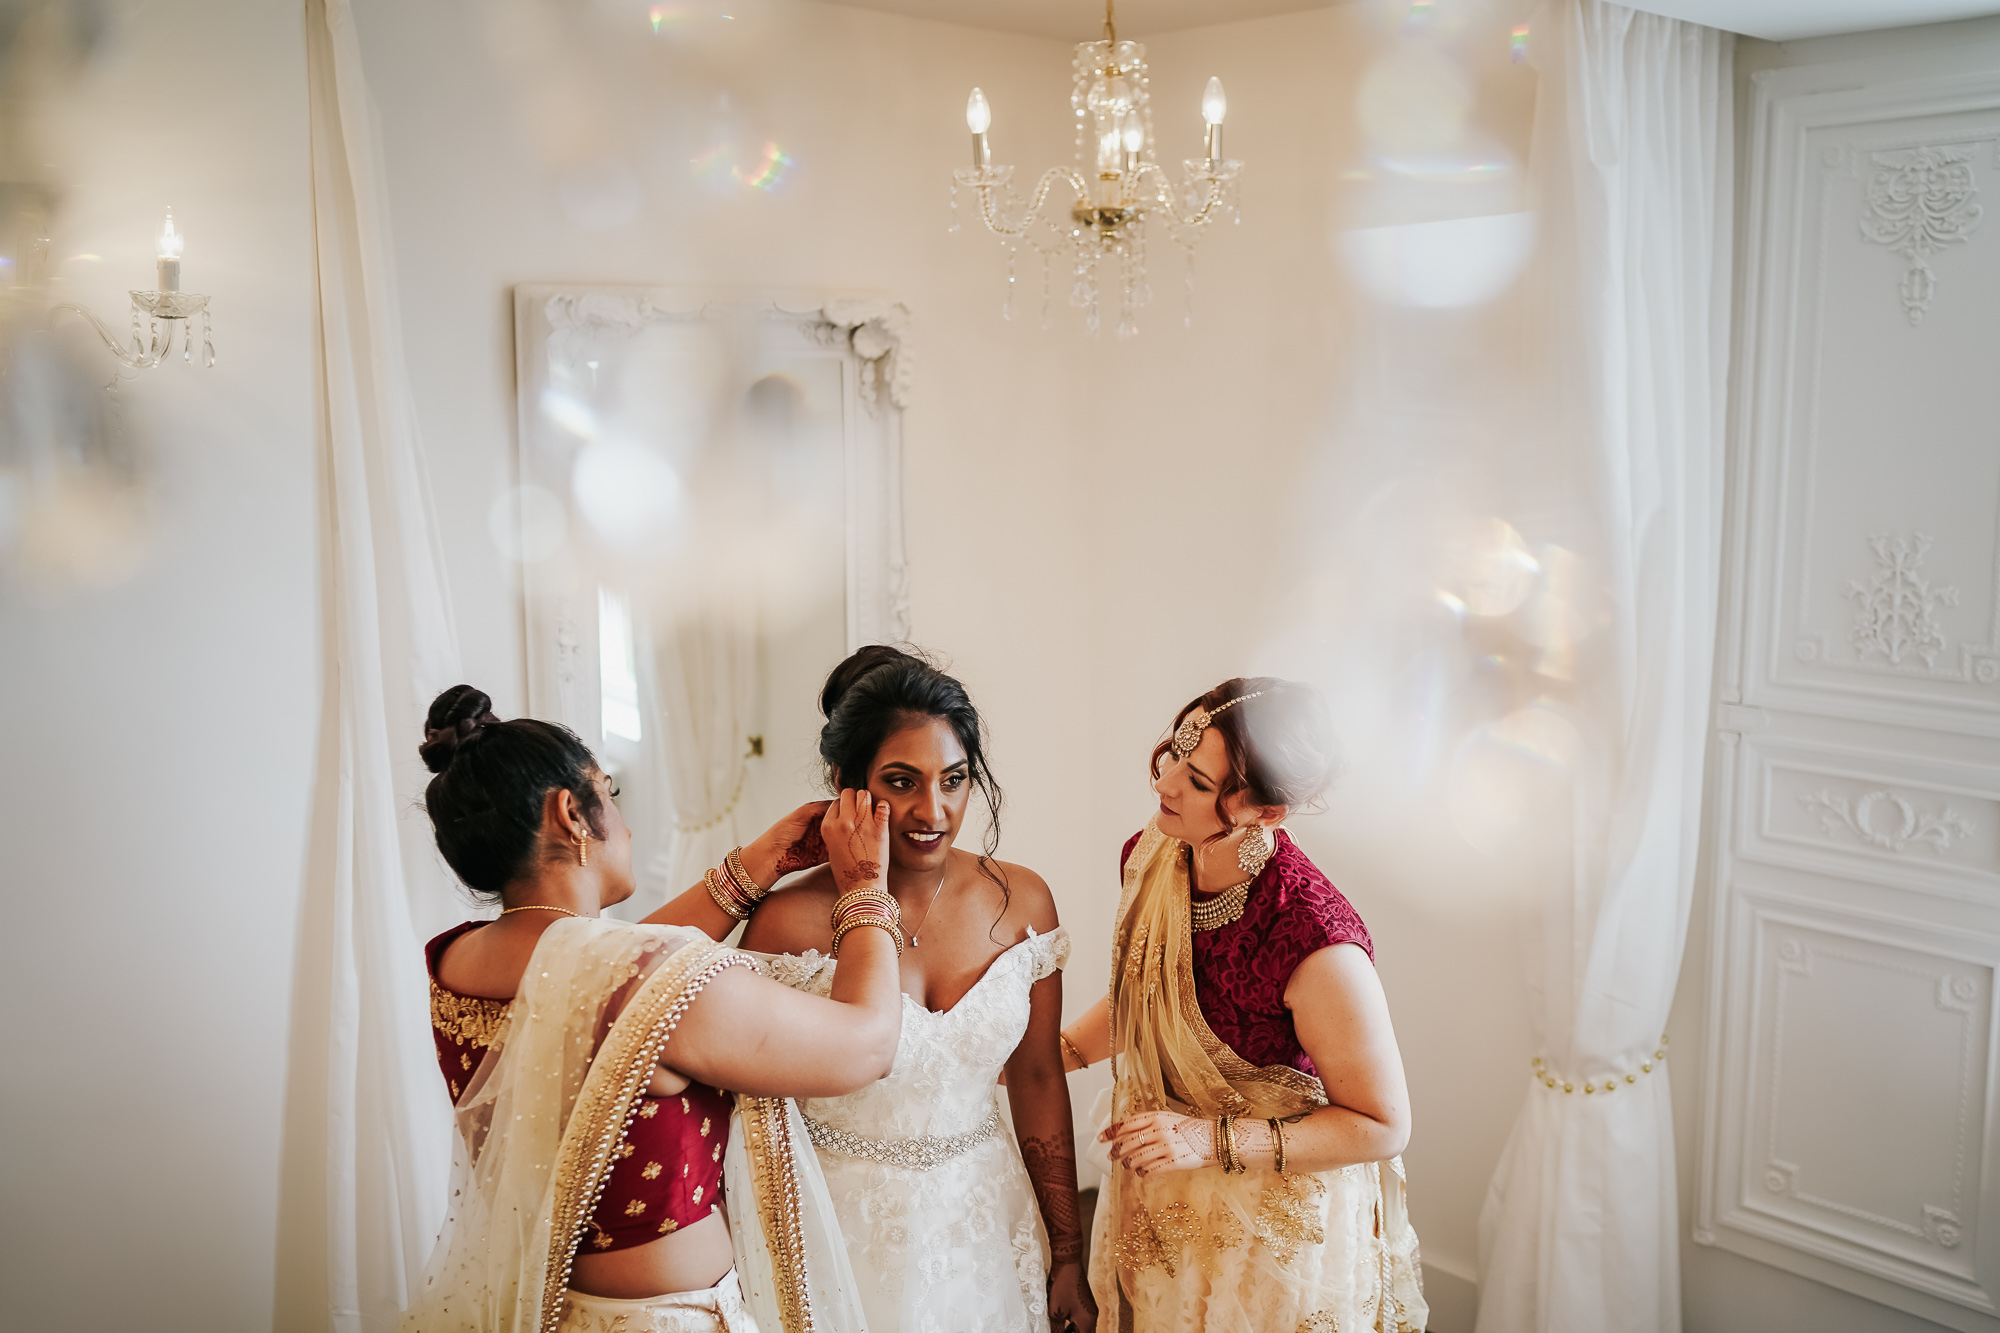 Alcumlow Hall Farm Indian Wedding Photographer (24 of 44).jpg